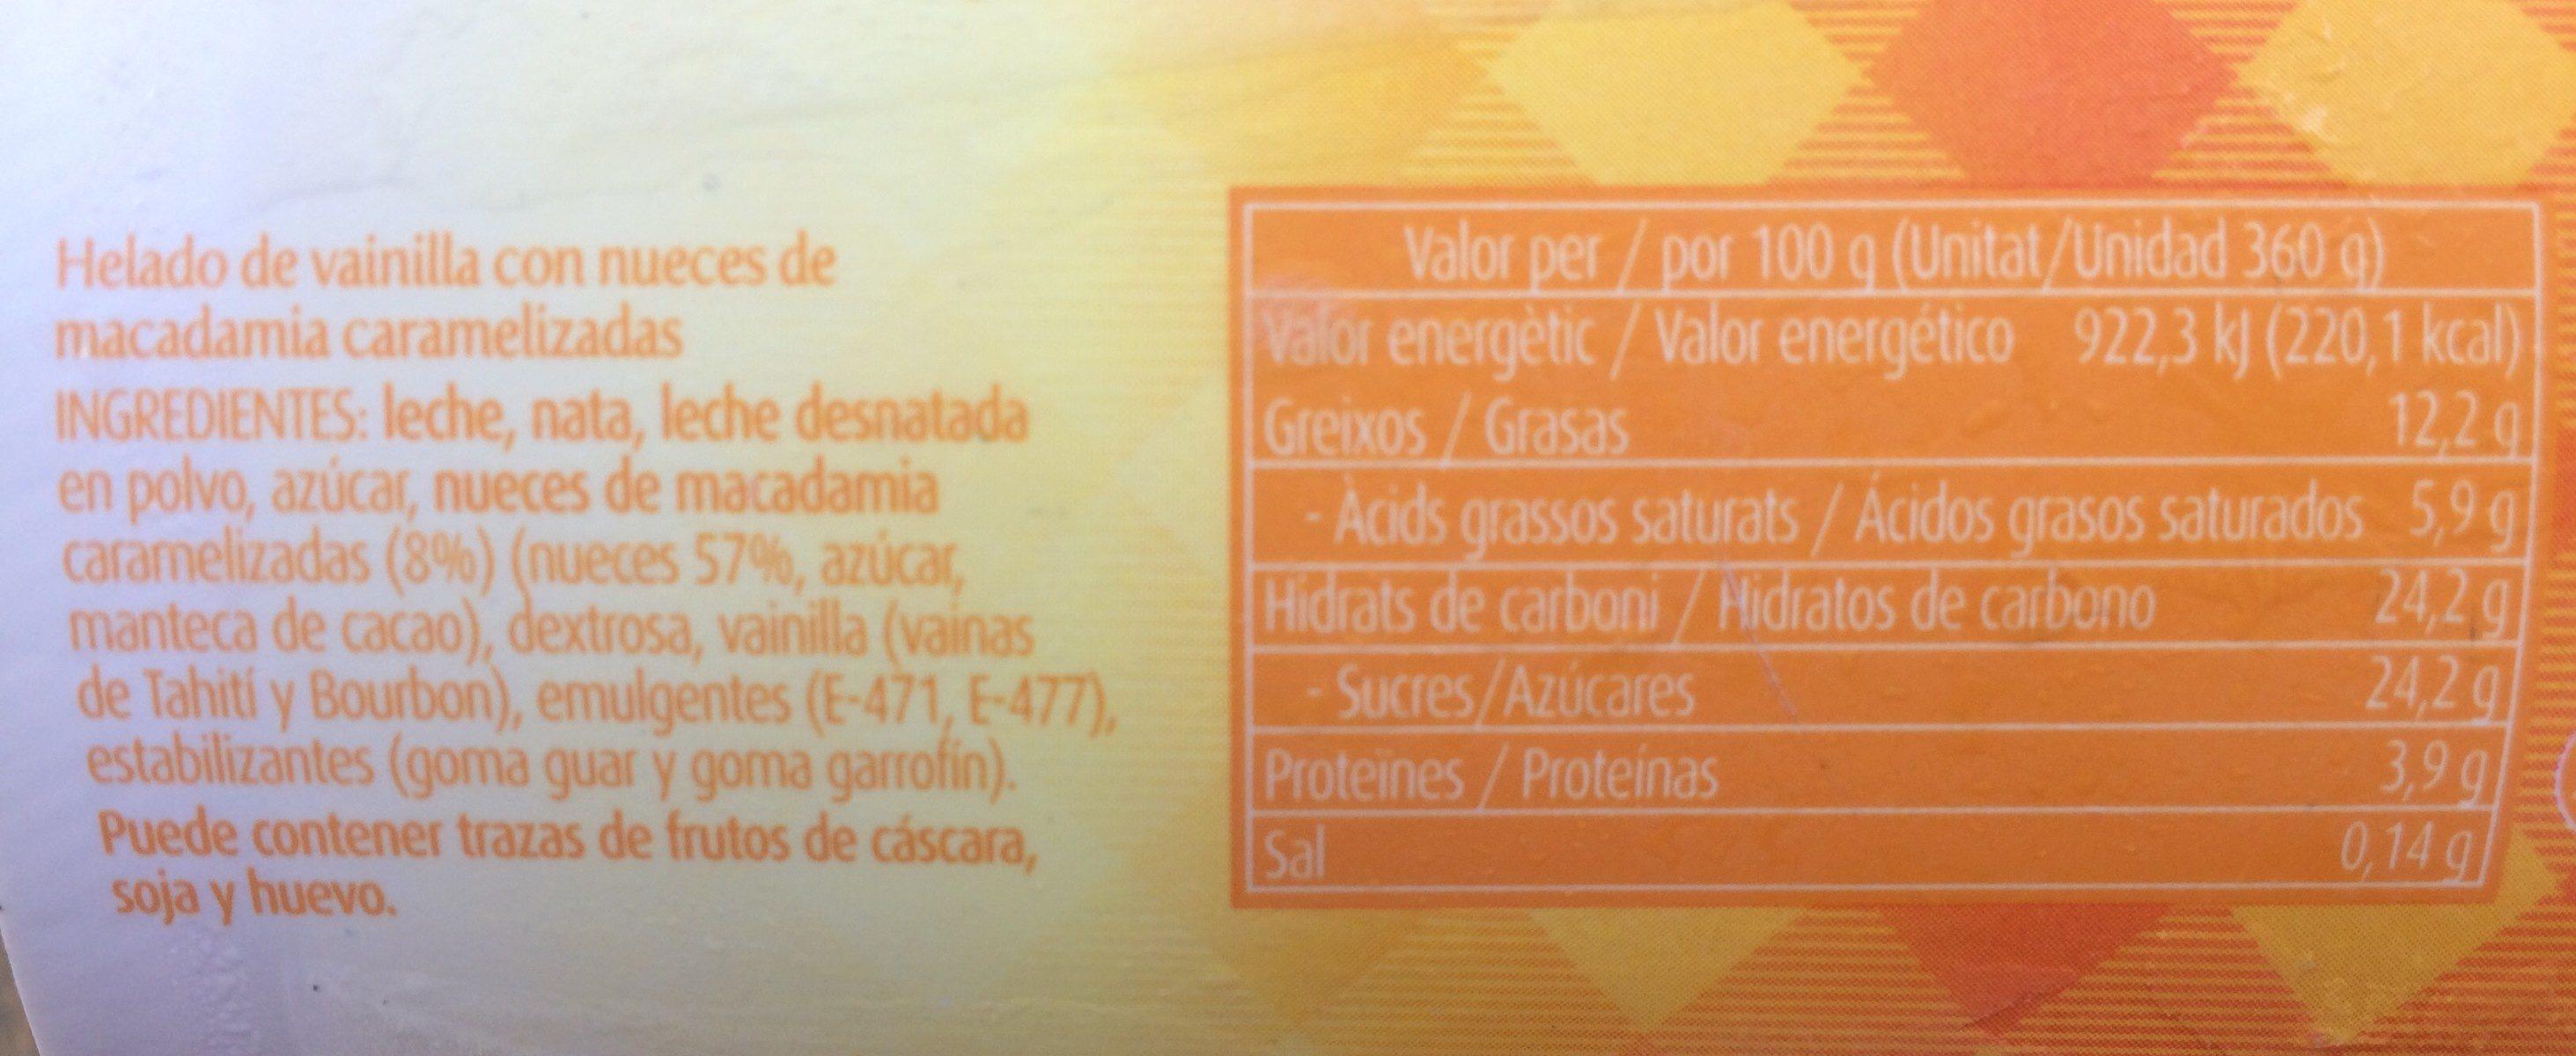 Gelat de vainilla amb nous de macadamia - Ingredientes